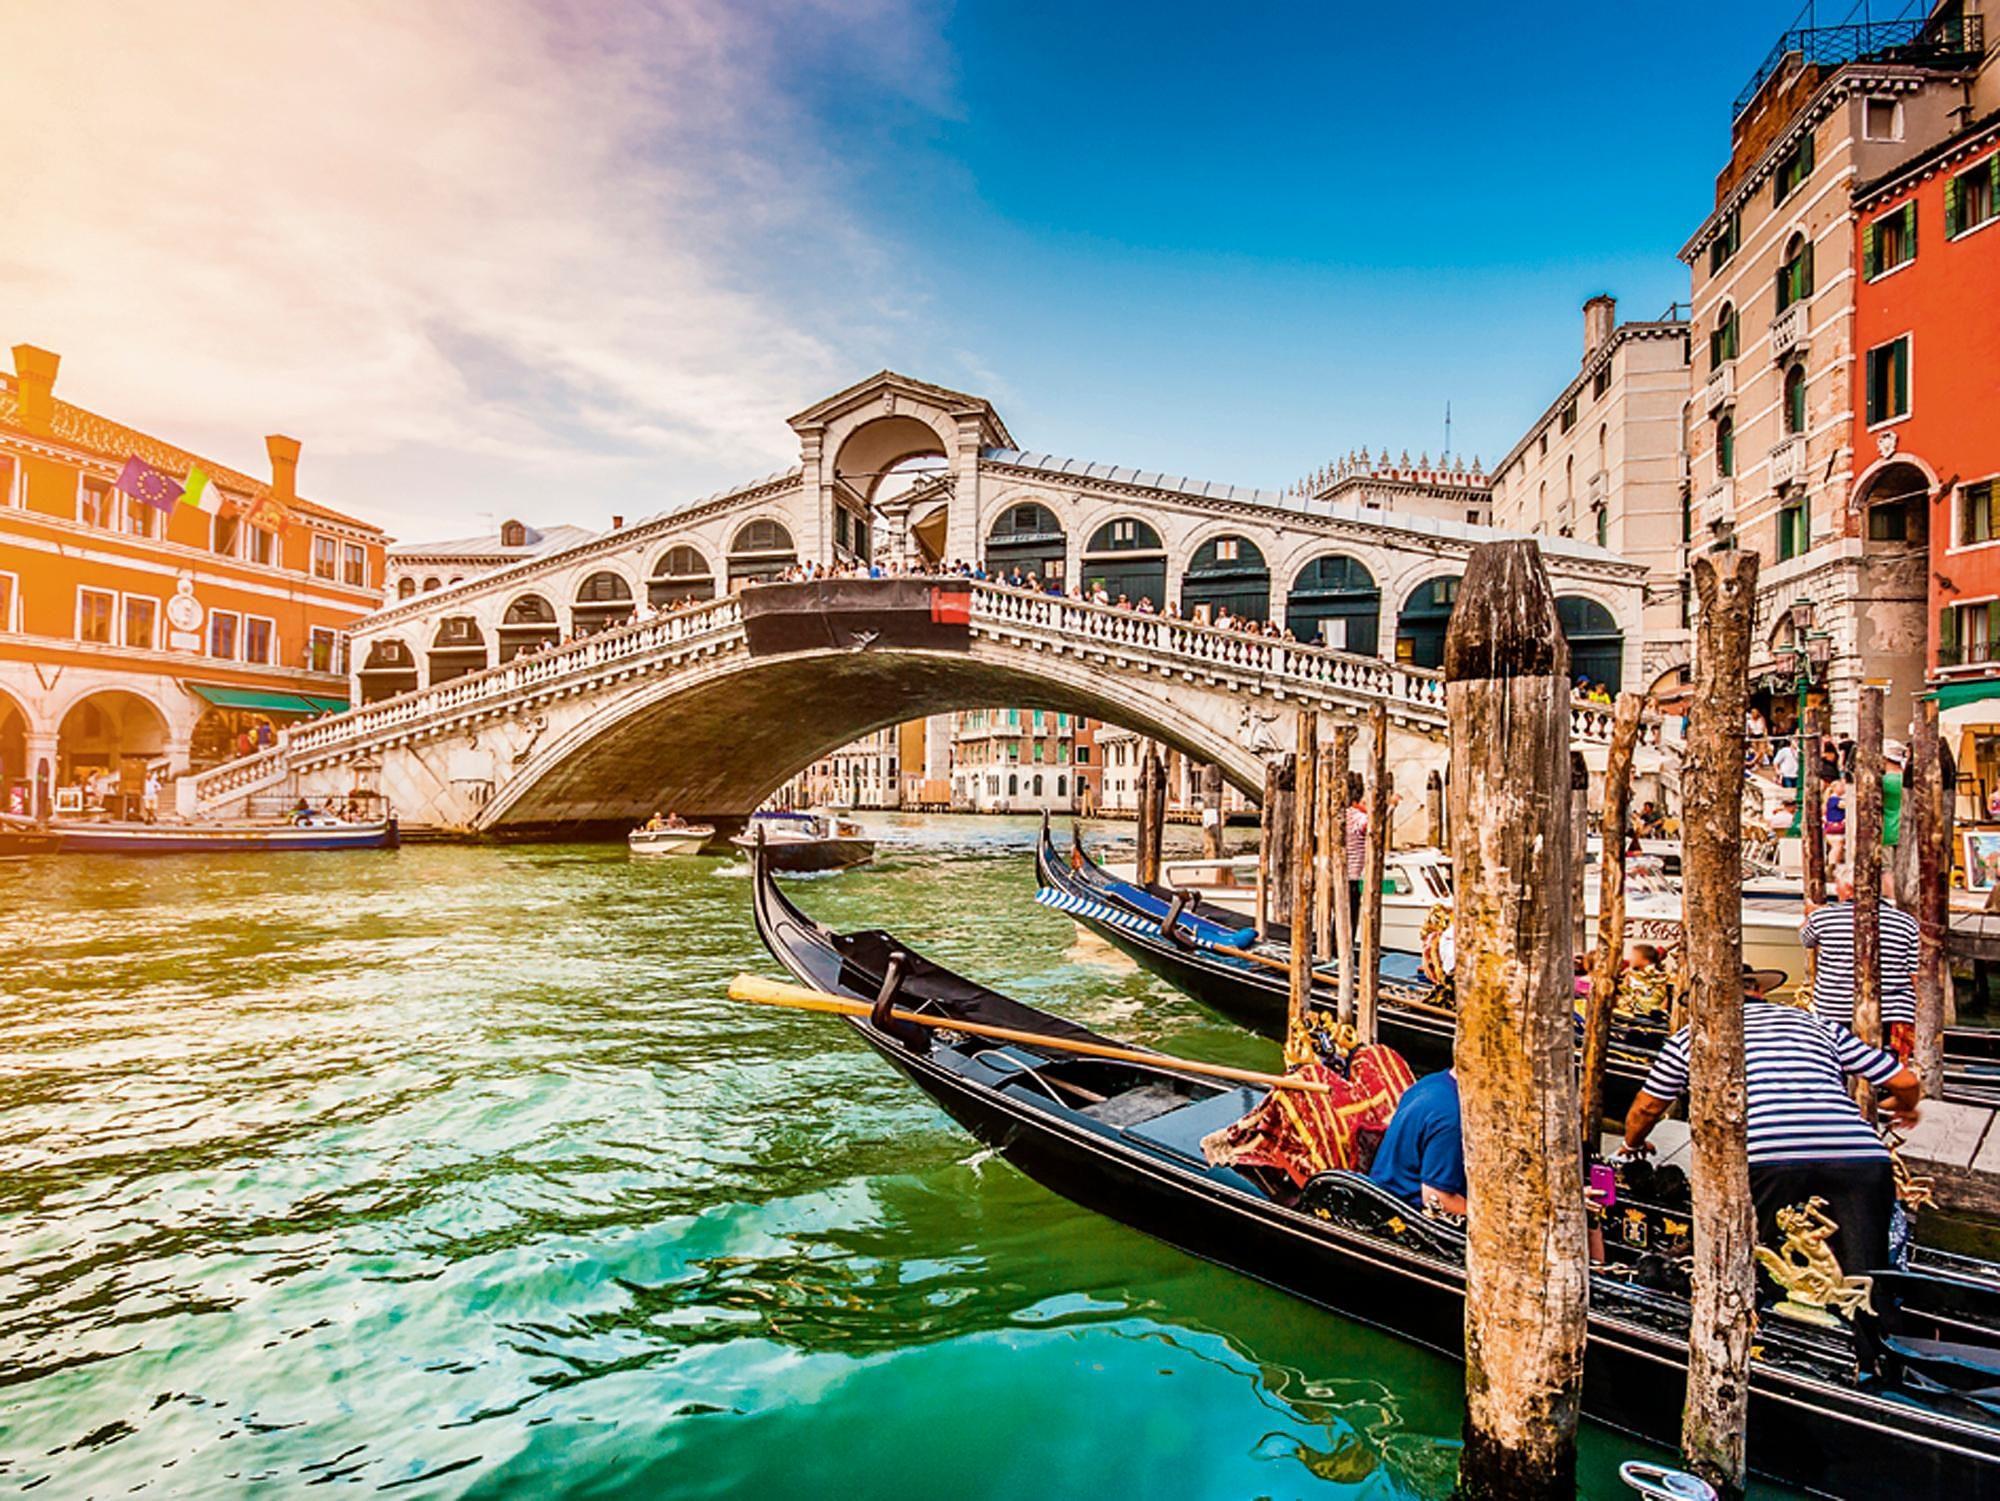 Home affaire Glasbild »canadastock: Panoramasicht auf den Canal Grande in Venedig«, 80/60 cm